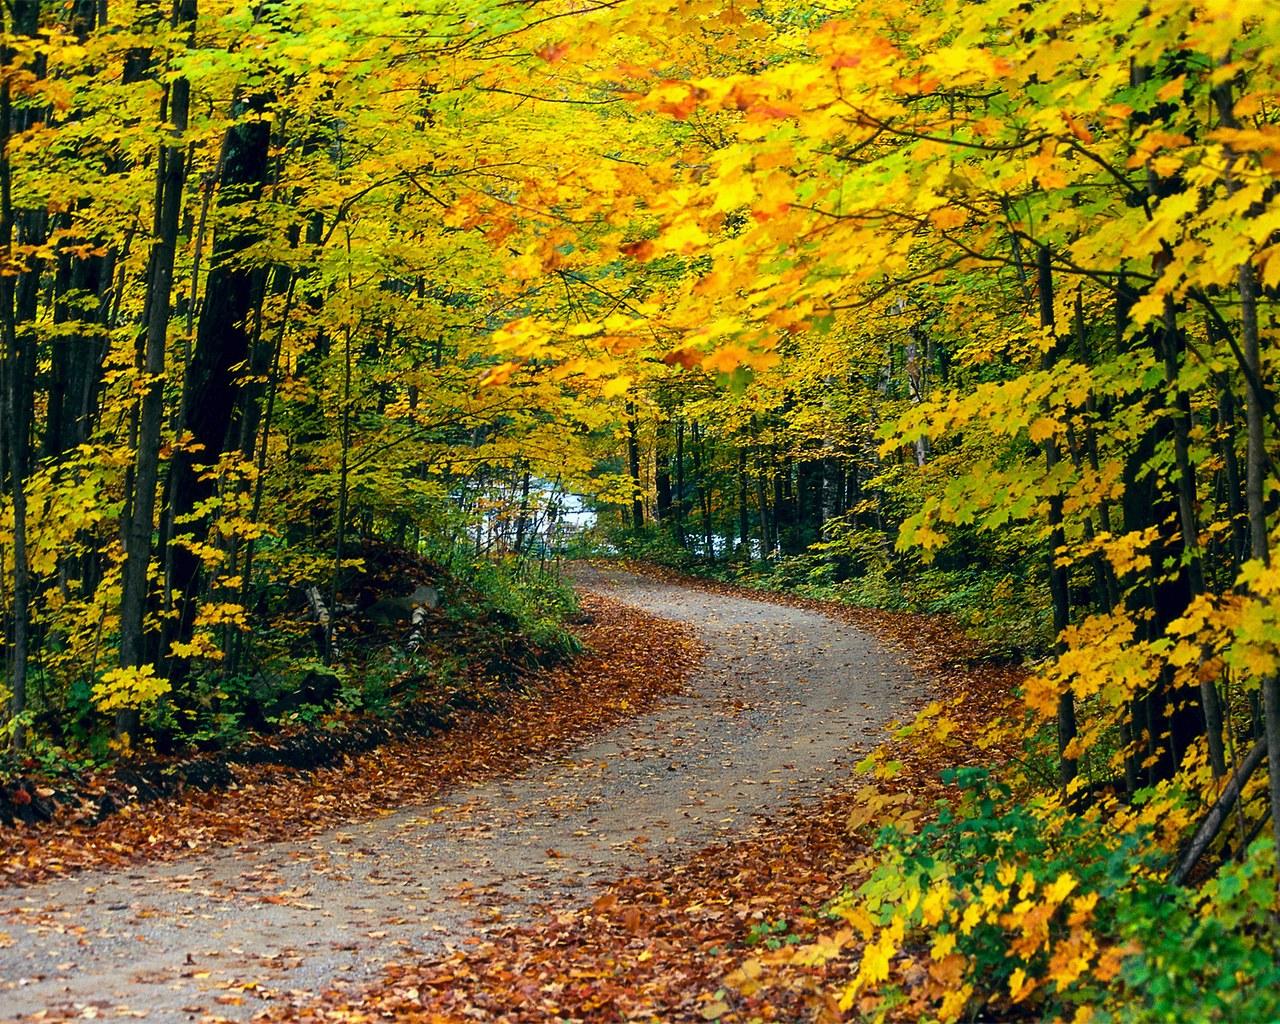 The best top autumn desktop wallpapers 13 En Güzel Sonbahar HD Duvar Kağıtları